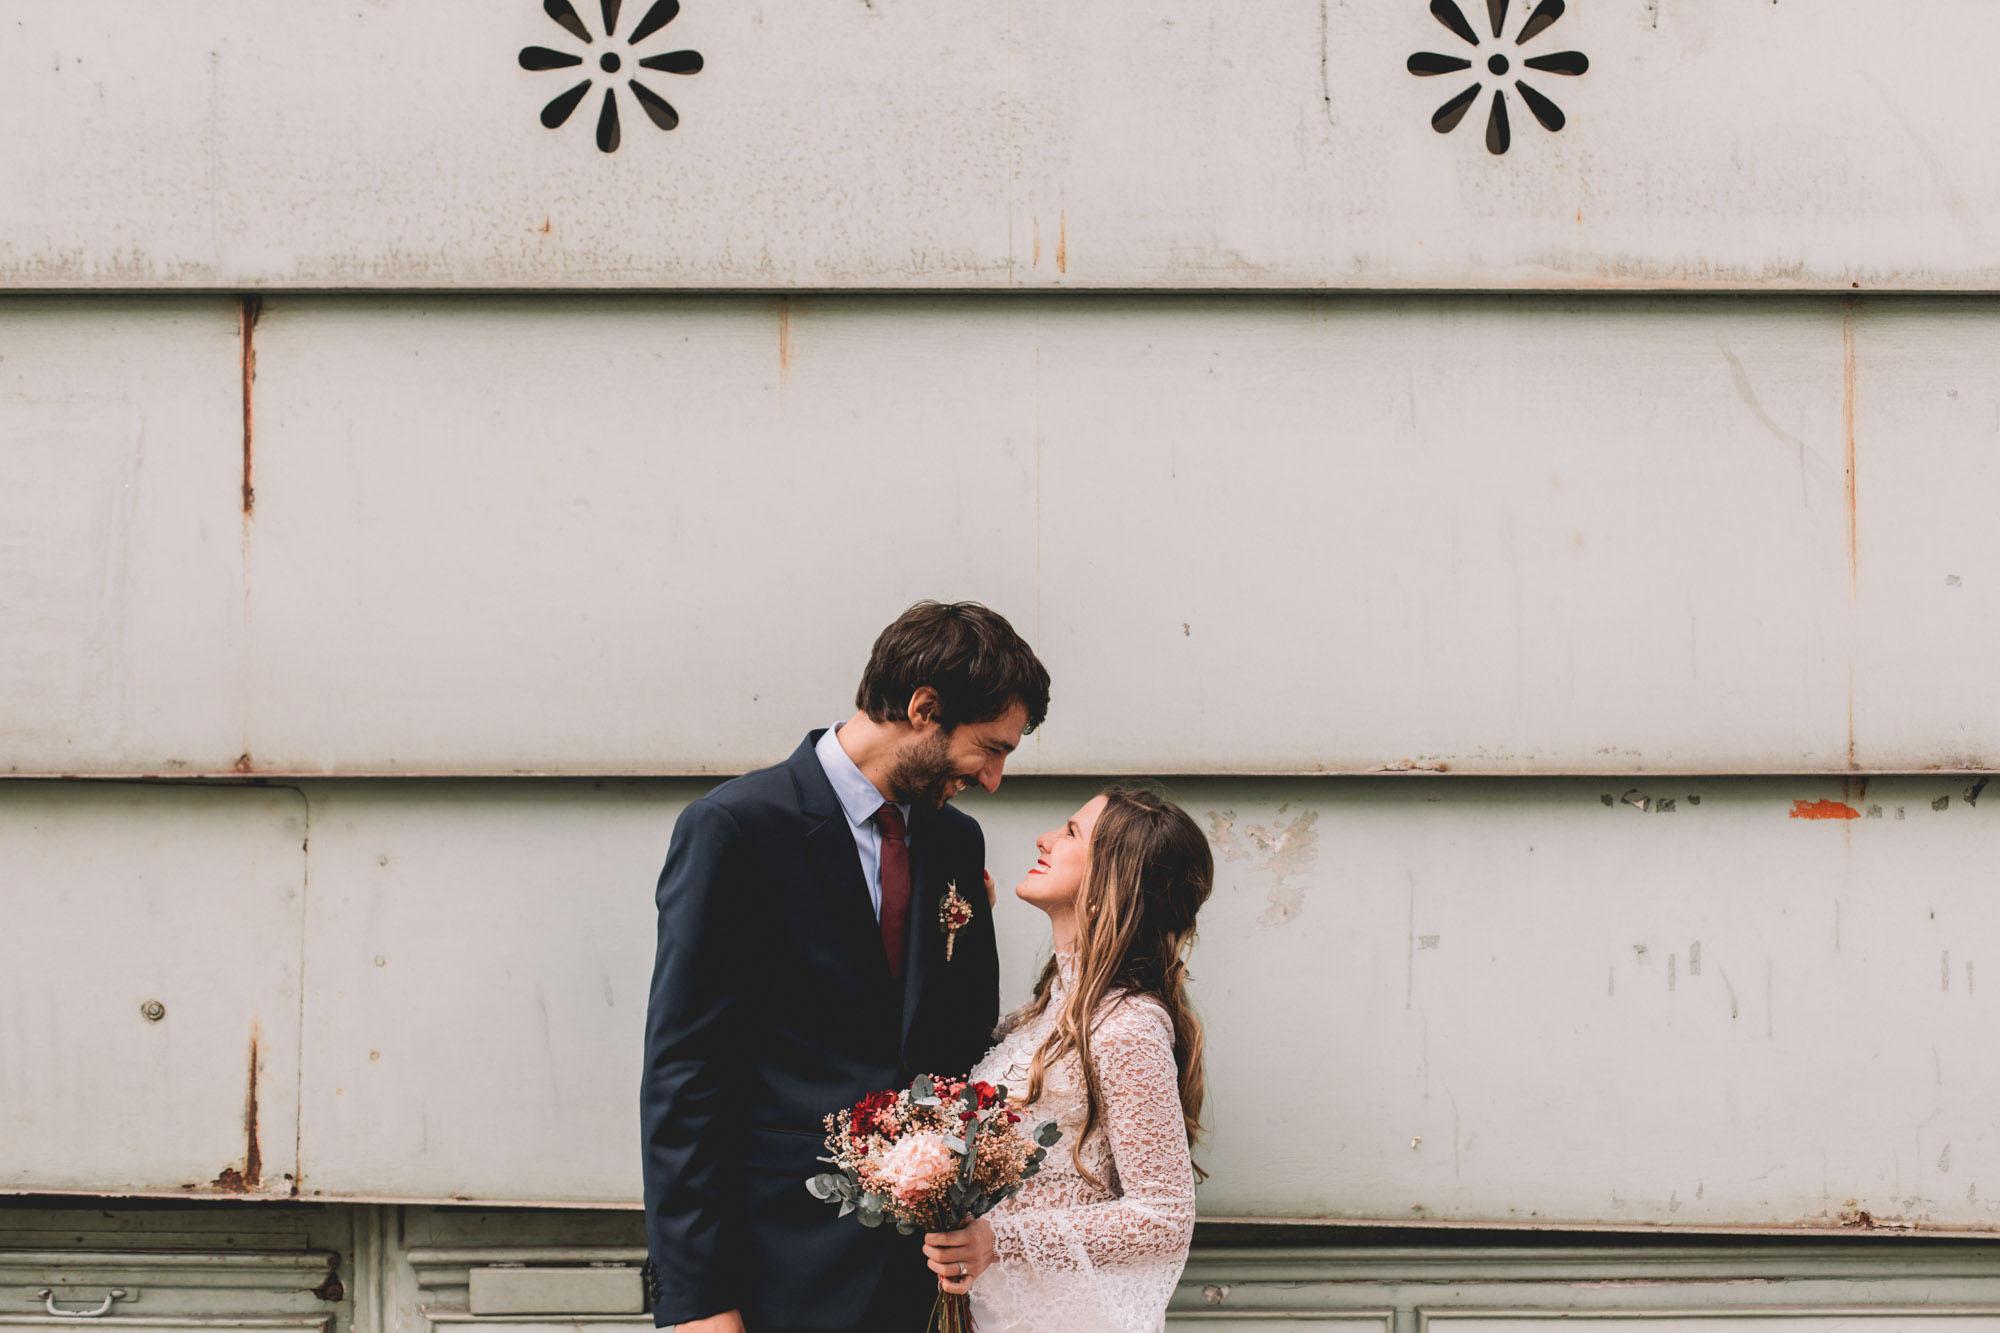 AXELLE + CHARLES_PARIS_PHOTOGRAPHE MARIAGE_LES BANDITS-2